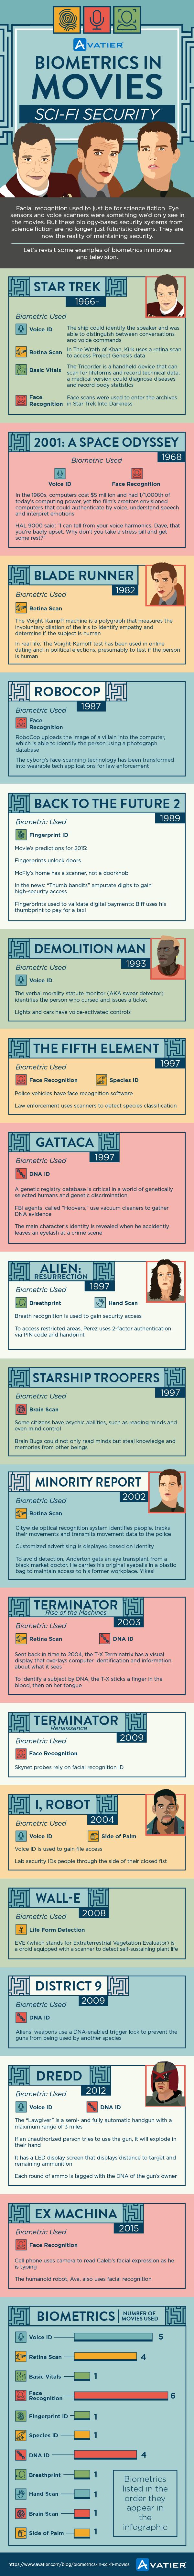 Biometrics in Movies